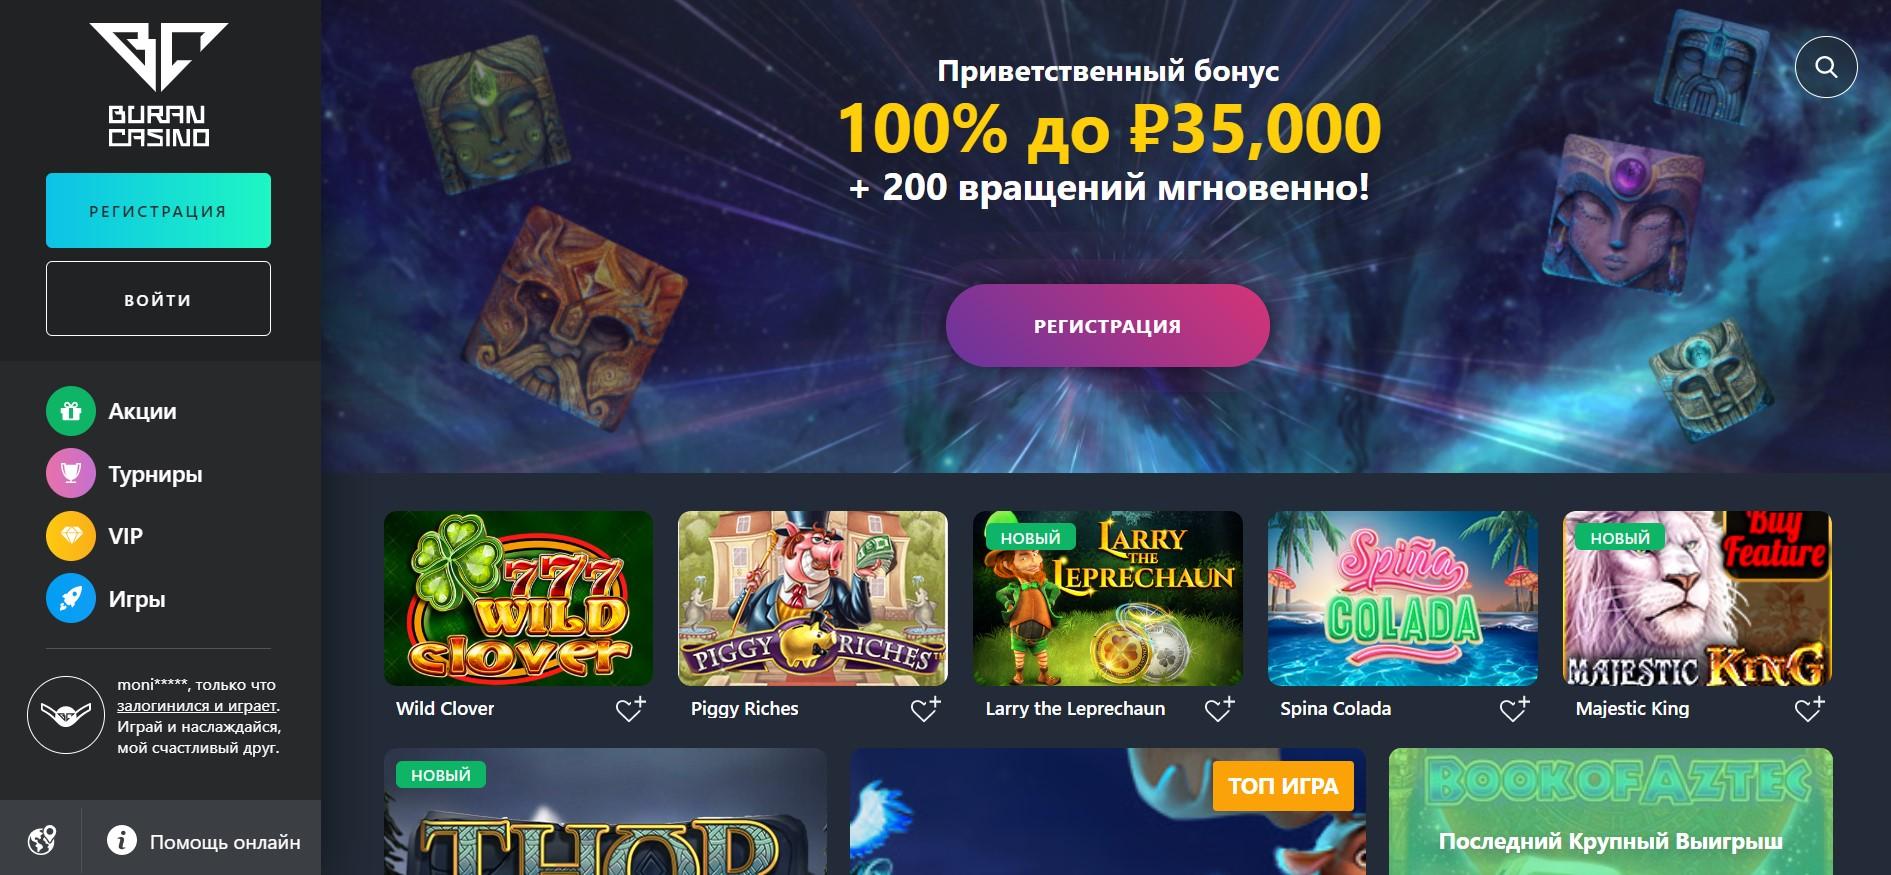 BuranCasino онлайн казино